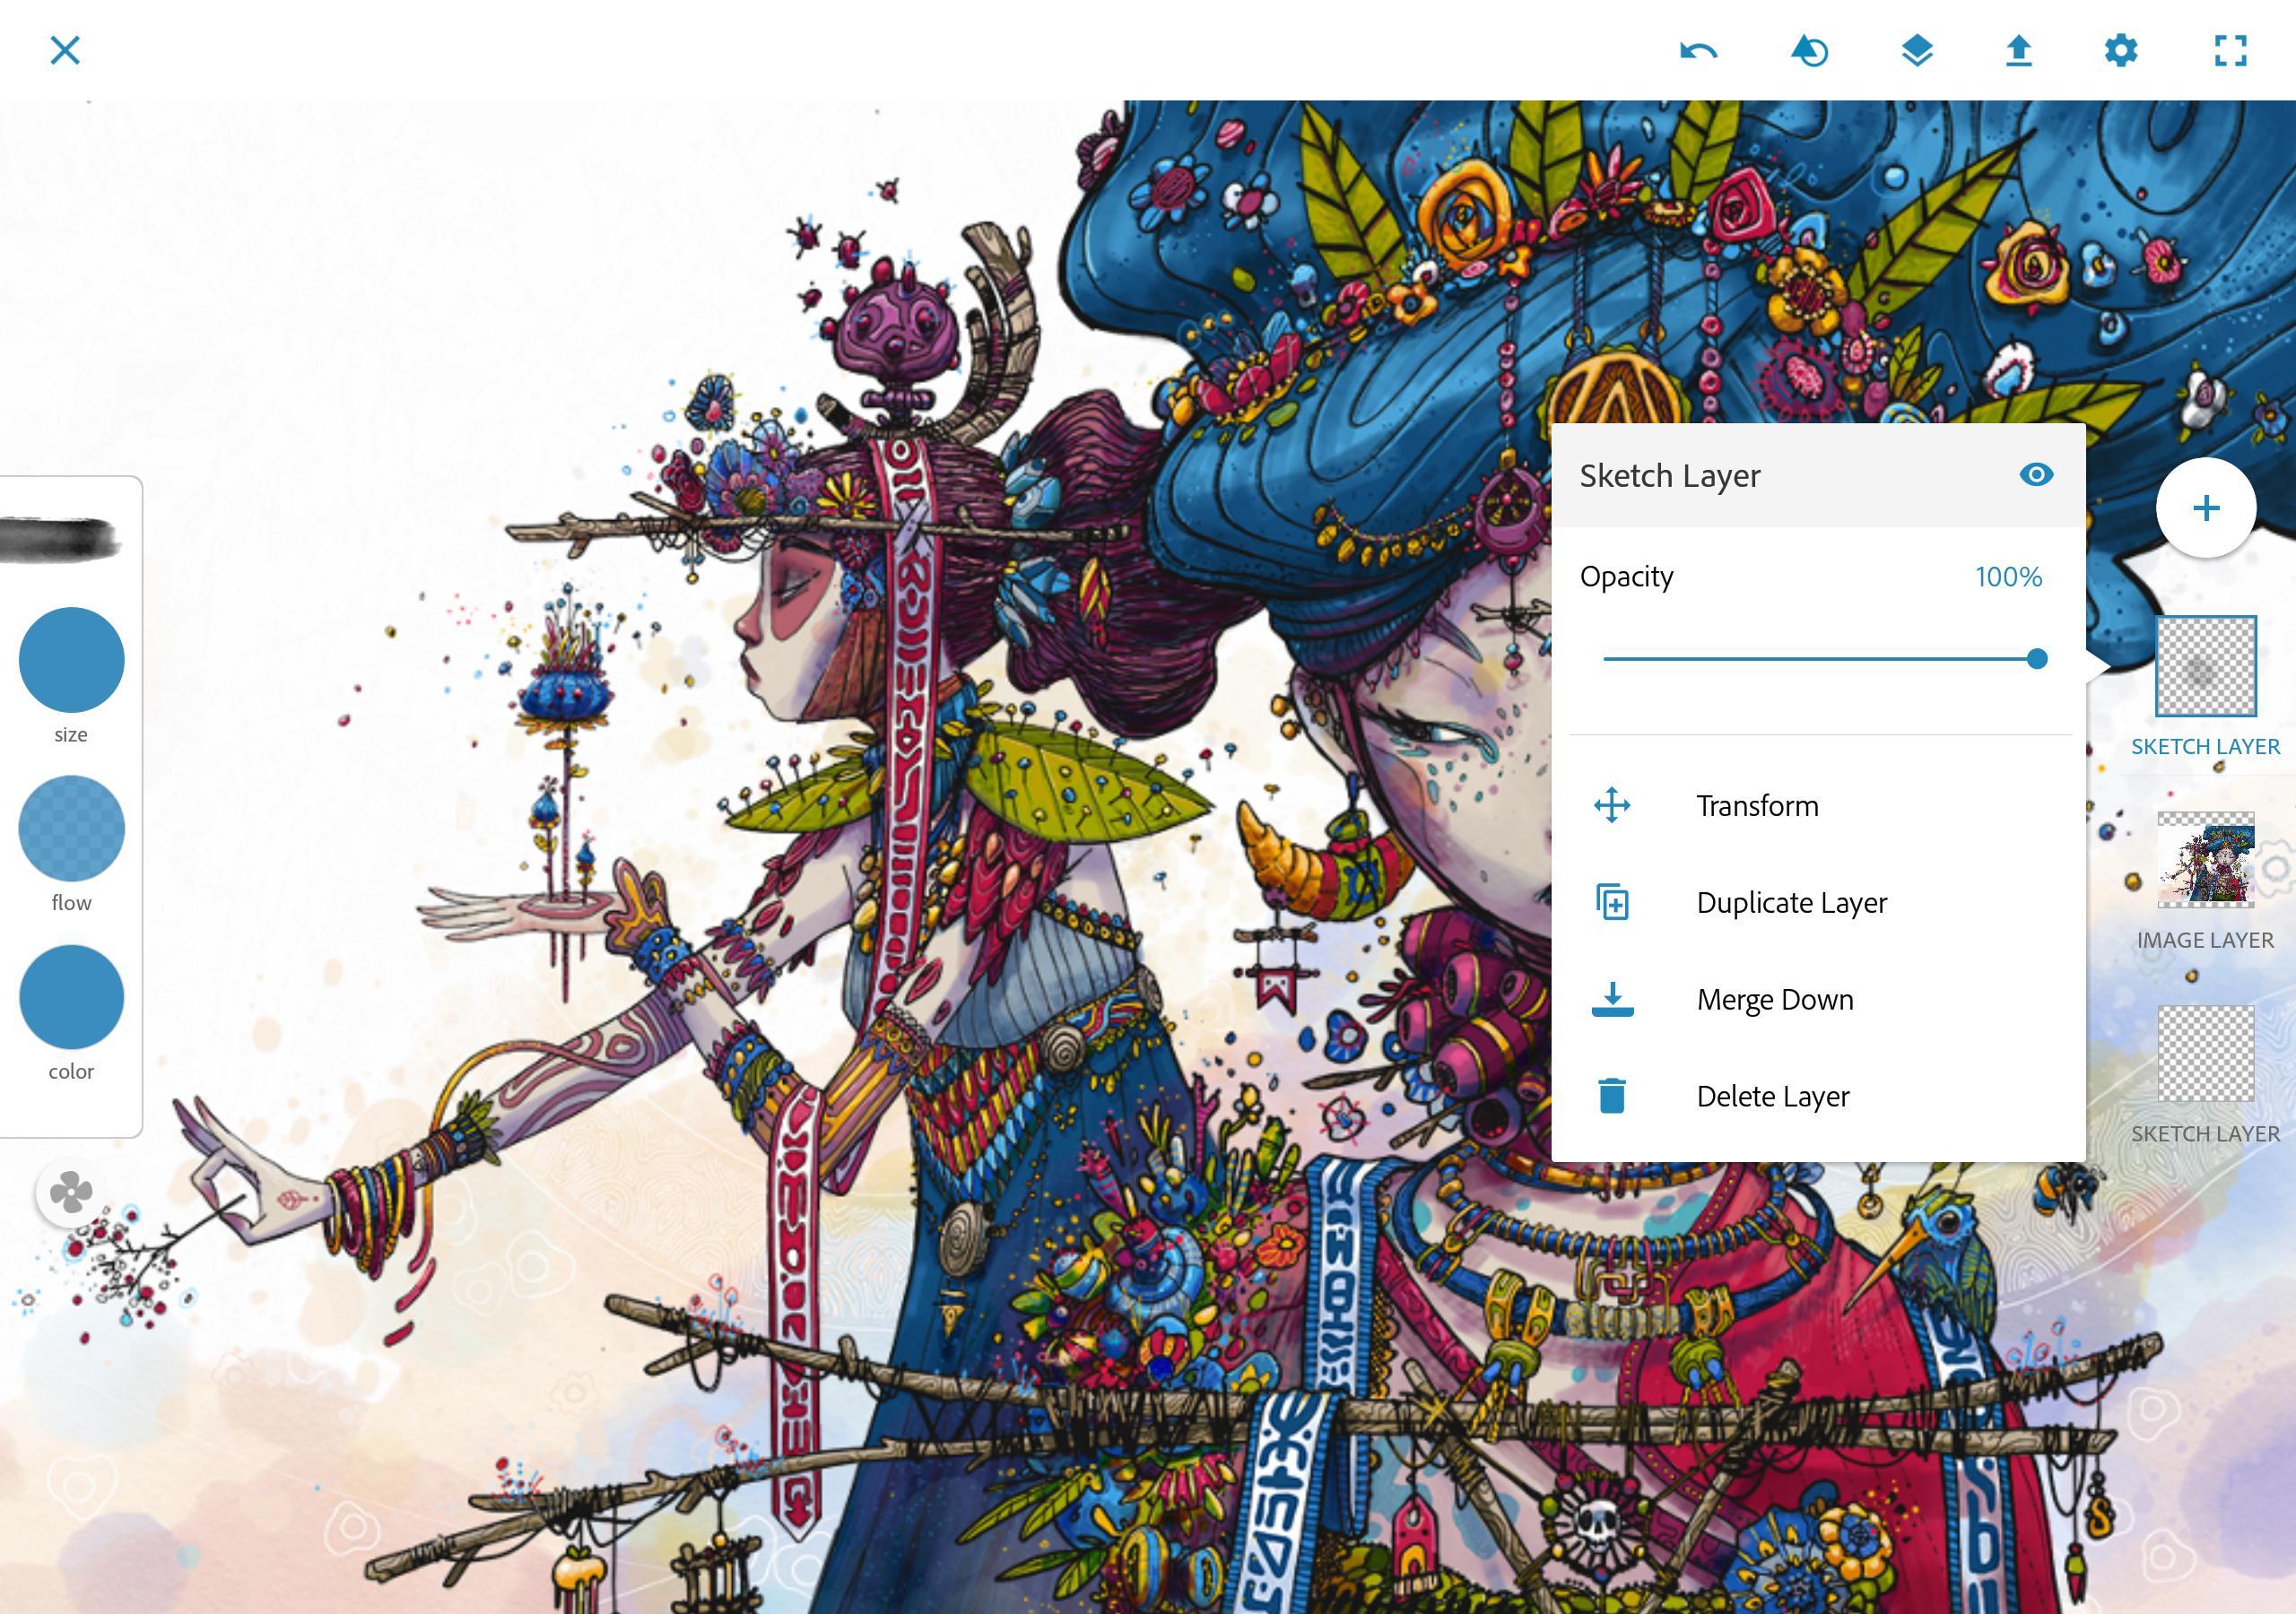 Aplikasi terpopuler di android Adobe Photoshop Sketch